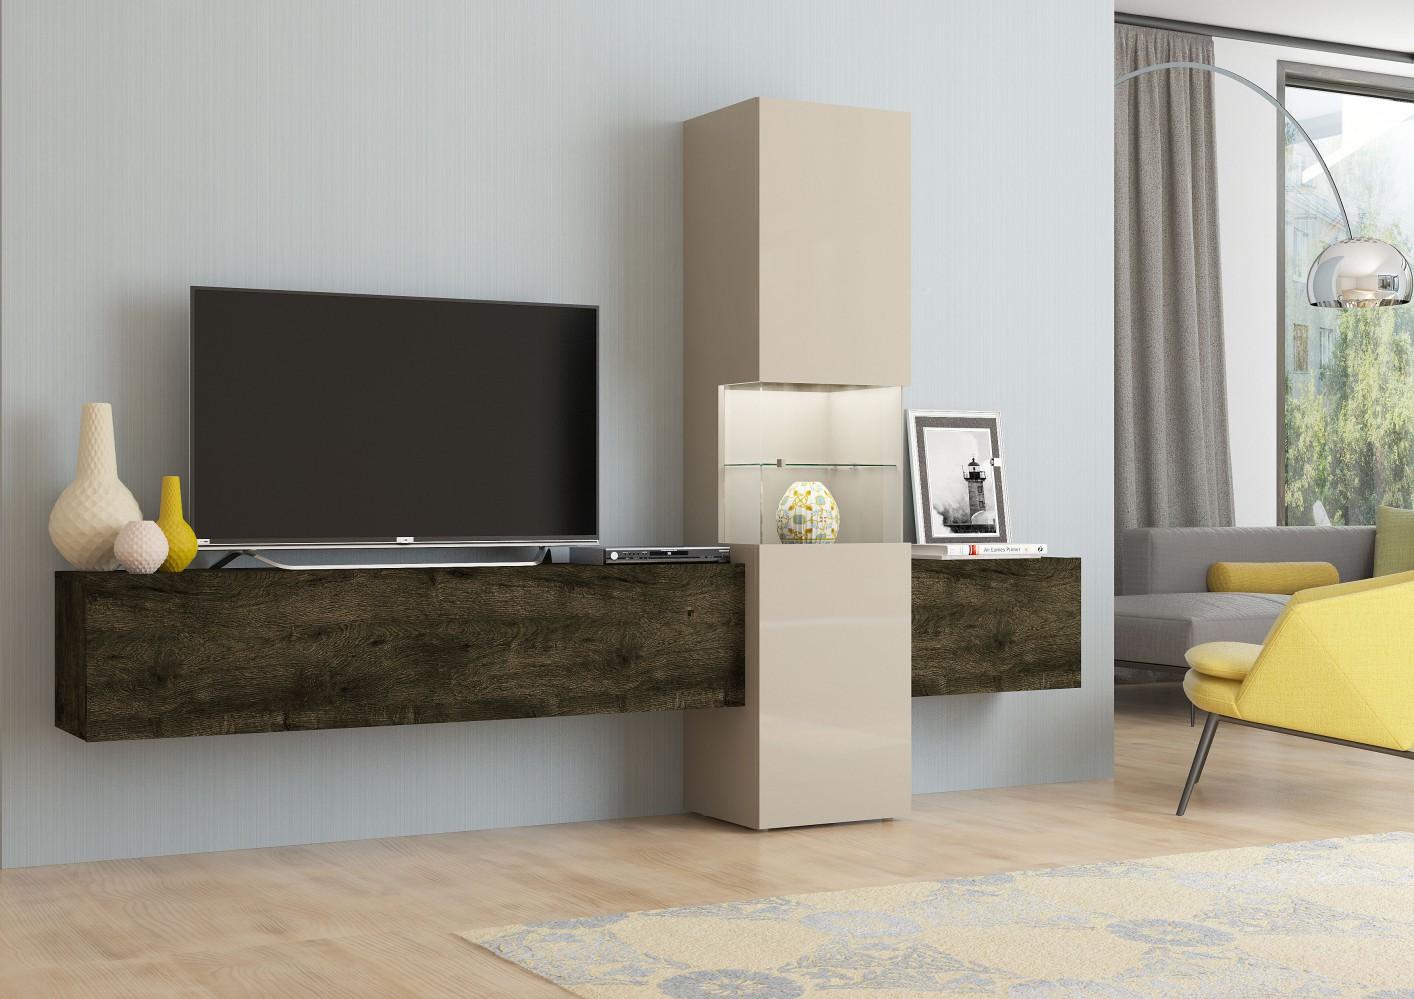 tecnos wohnwand incontro 3 tlg sandfarben eiche dunkel. Black Bedroom Furniture Sets. Home Design Ideas